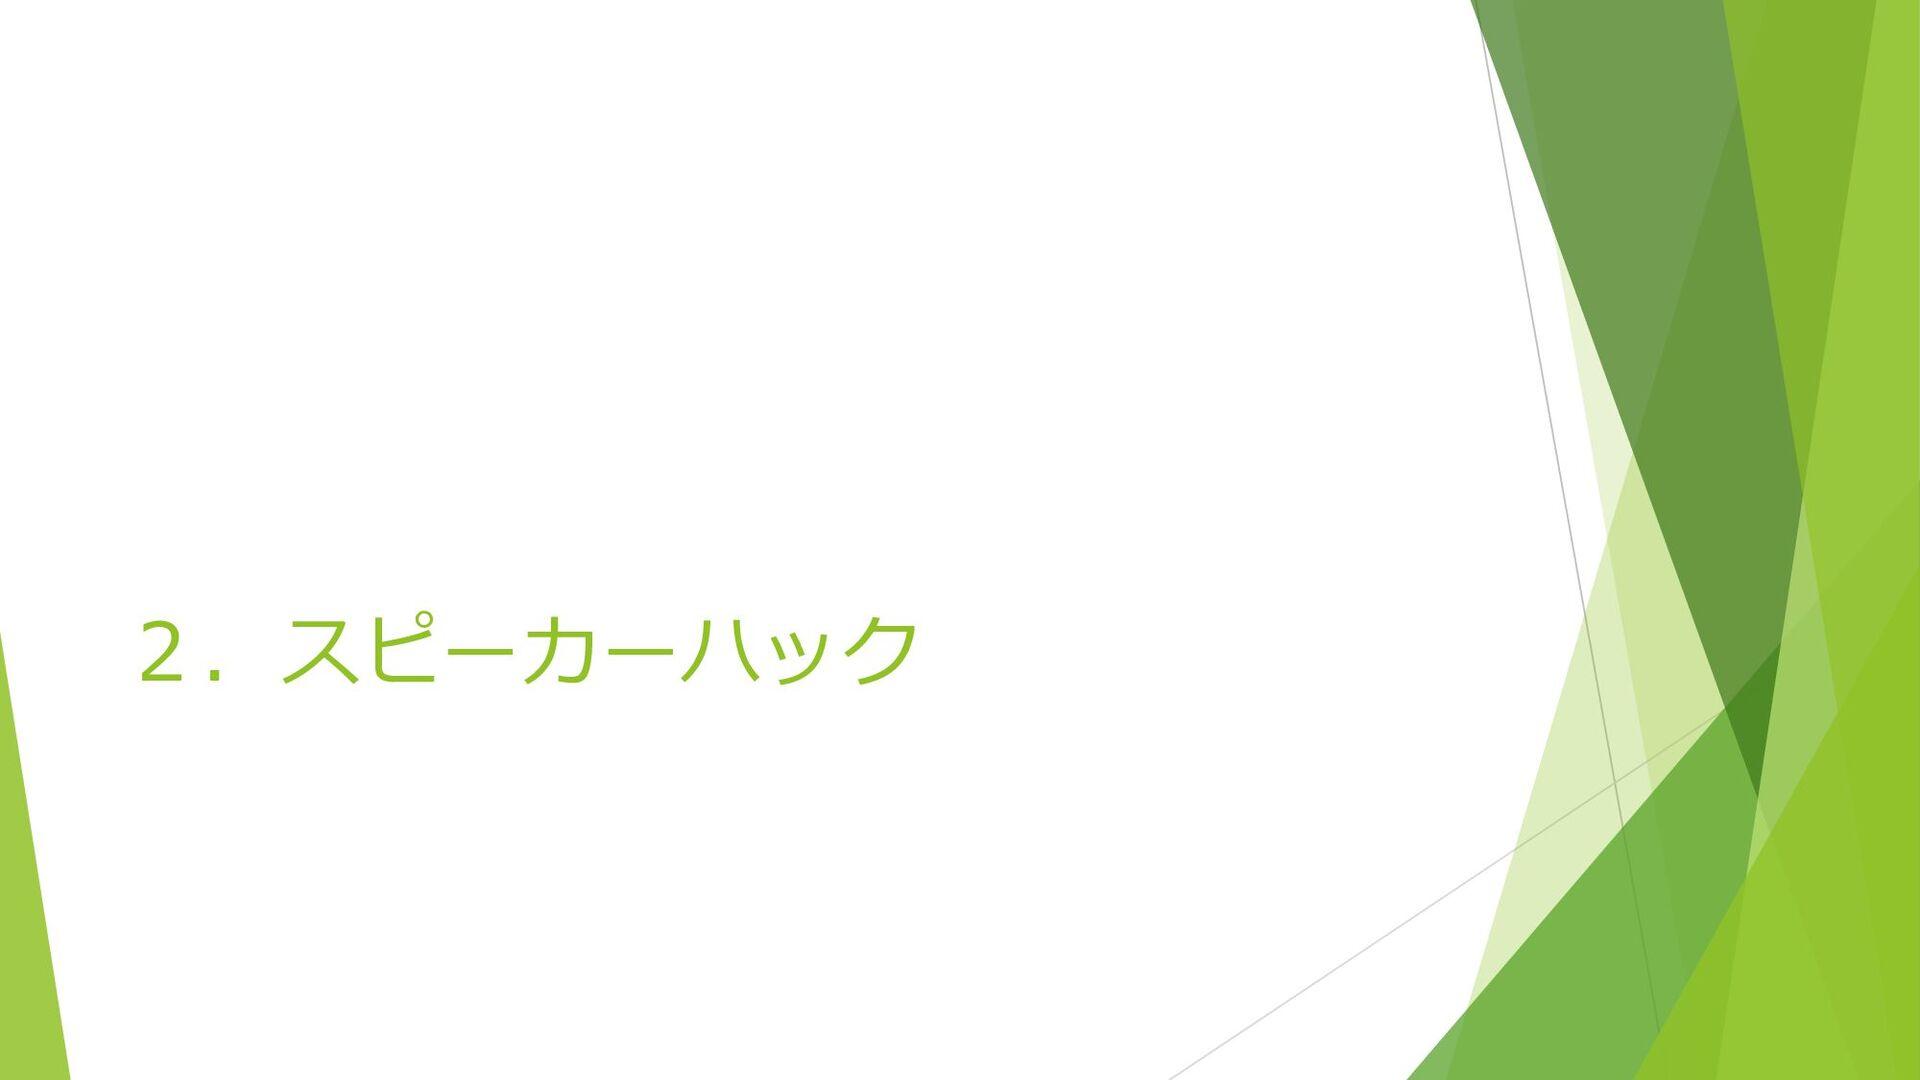 Micro:bit→IoT化 Obniz→センサー化 IoTコインカウン ターに! 計測値取れ...